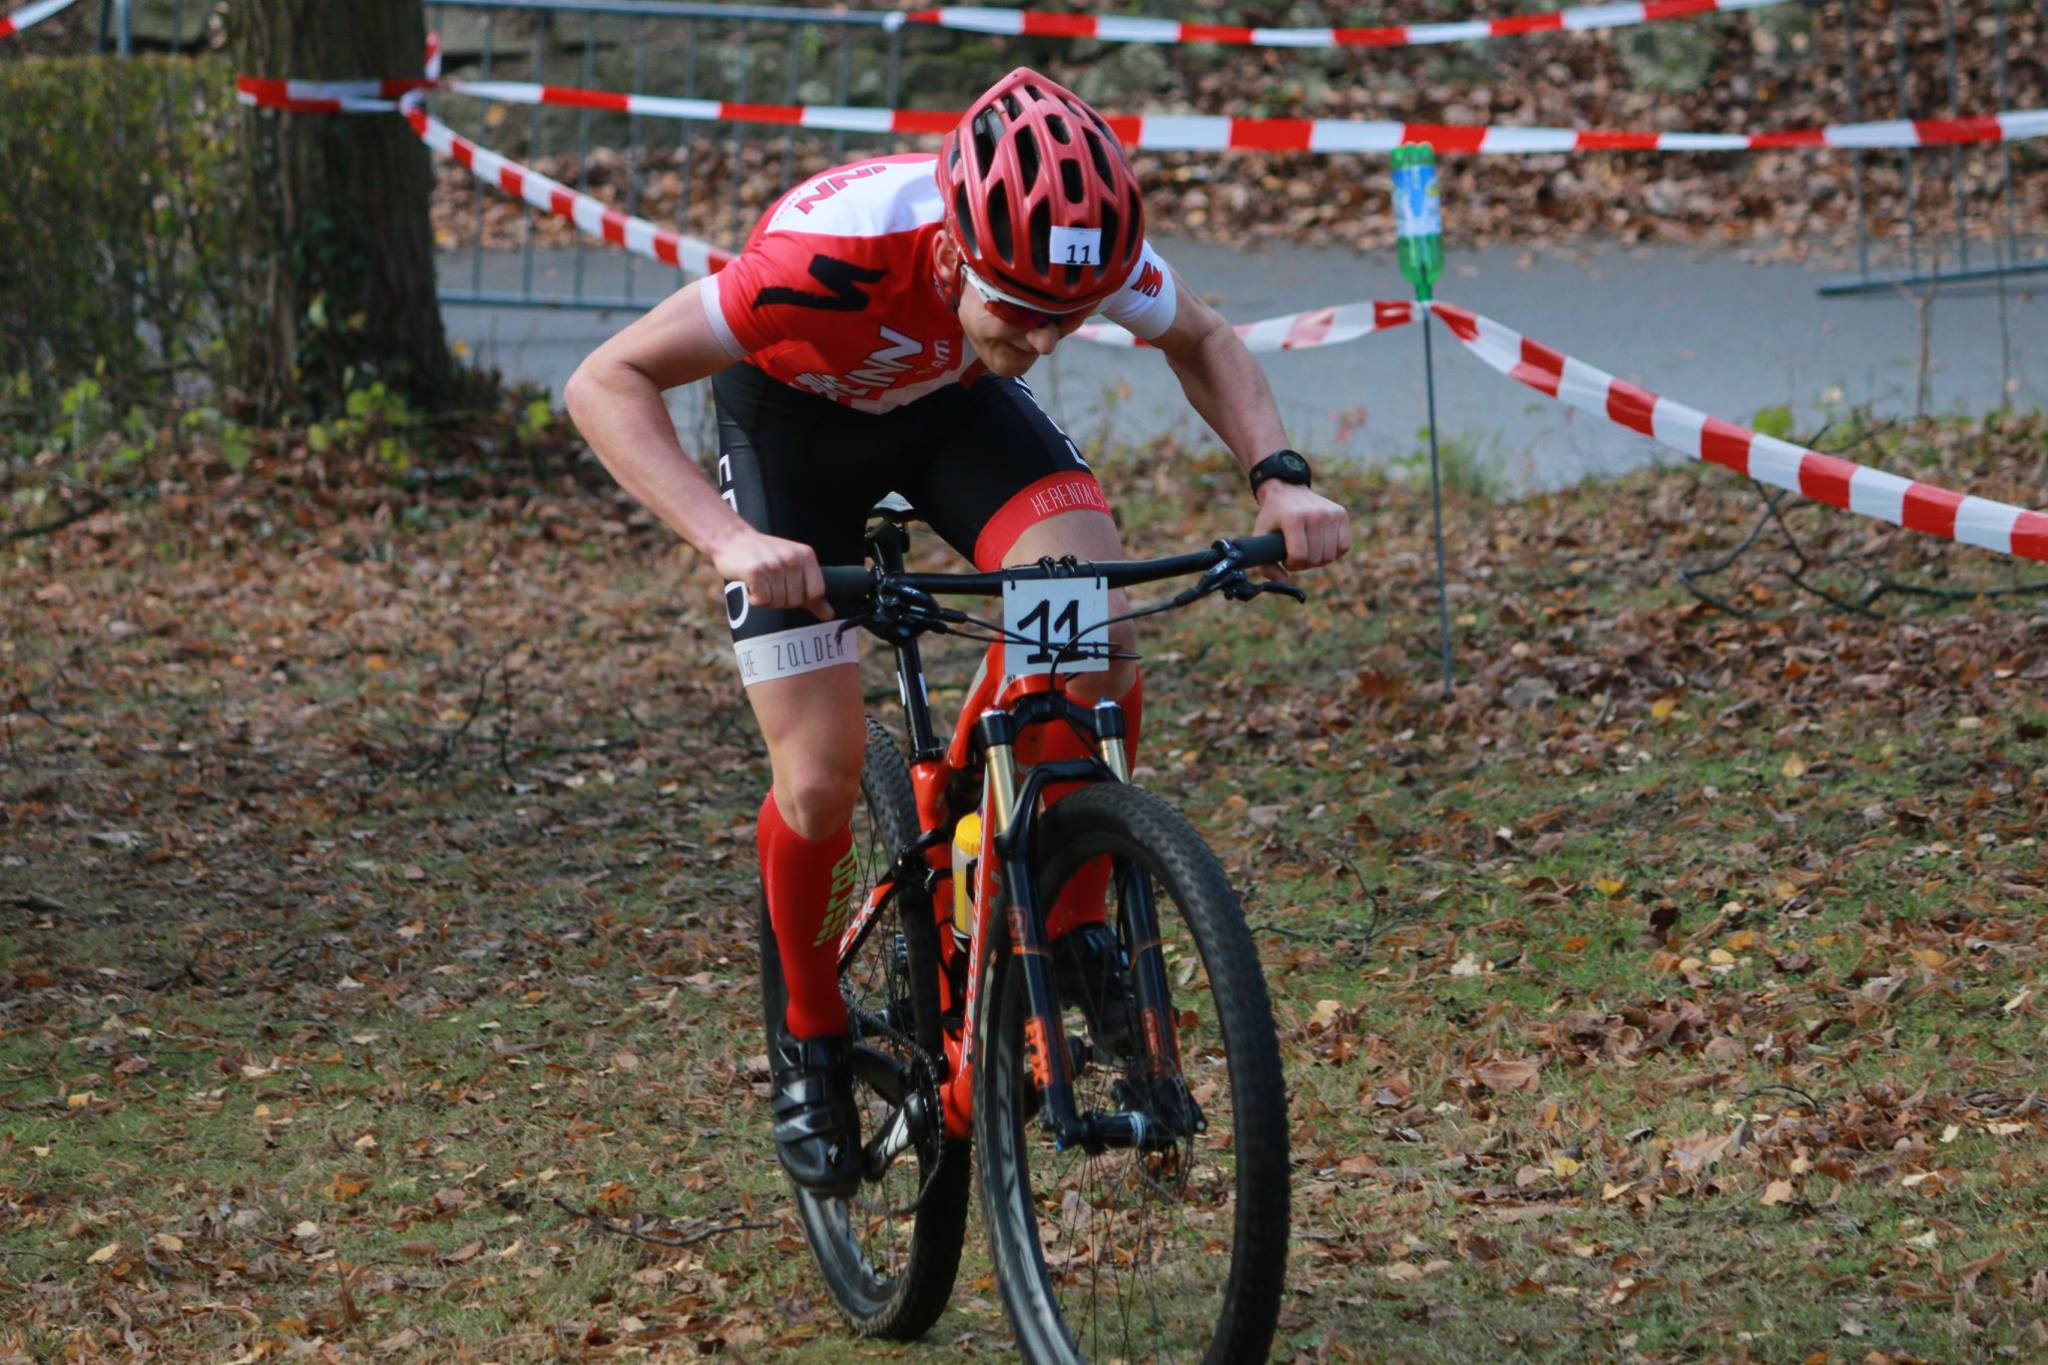 matthias-cloostermans-bike-wommelgem-2016